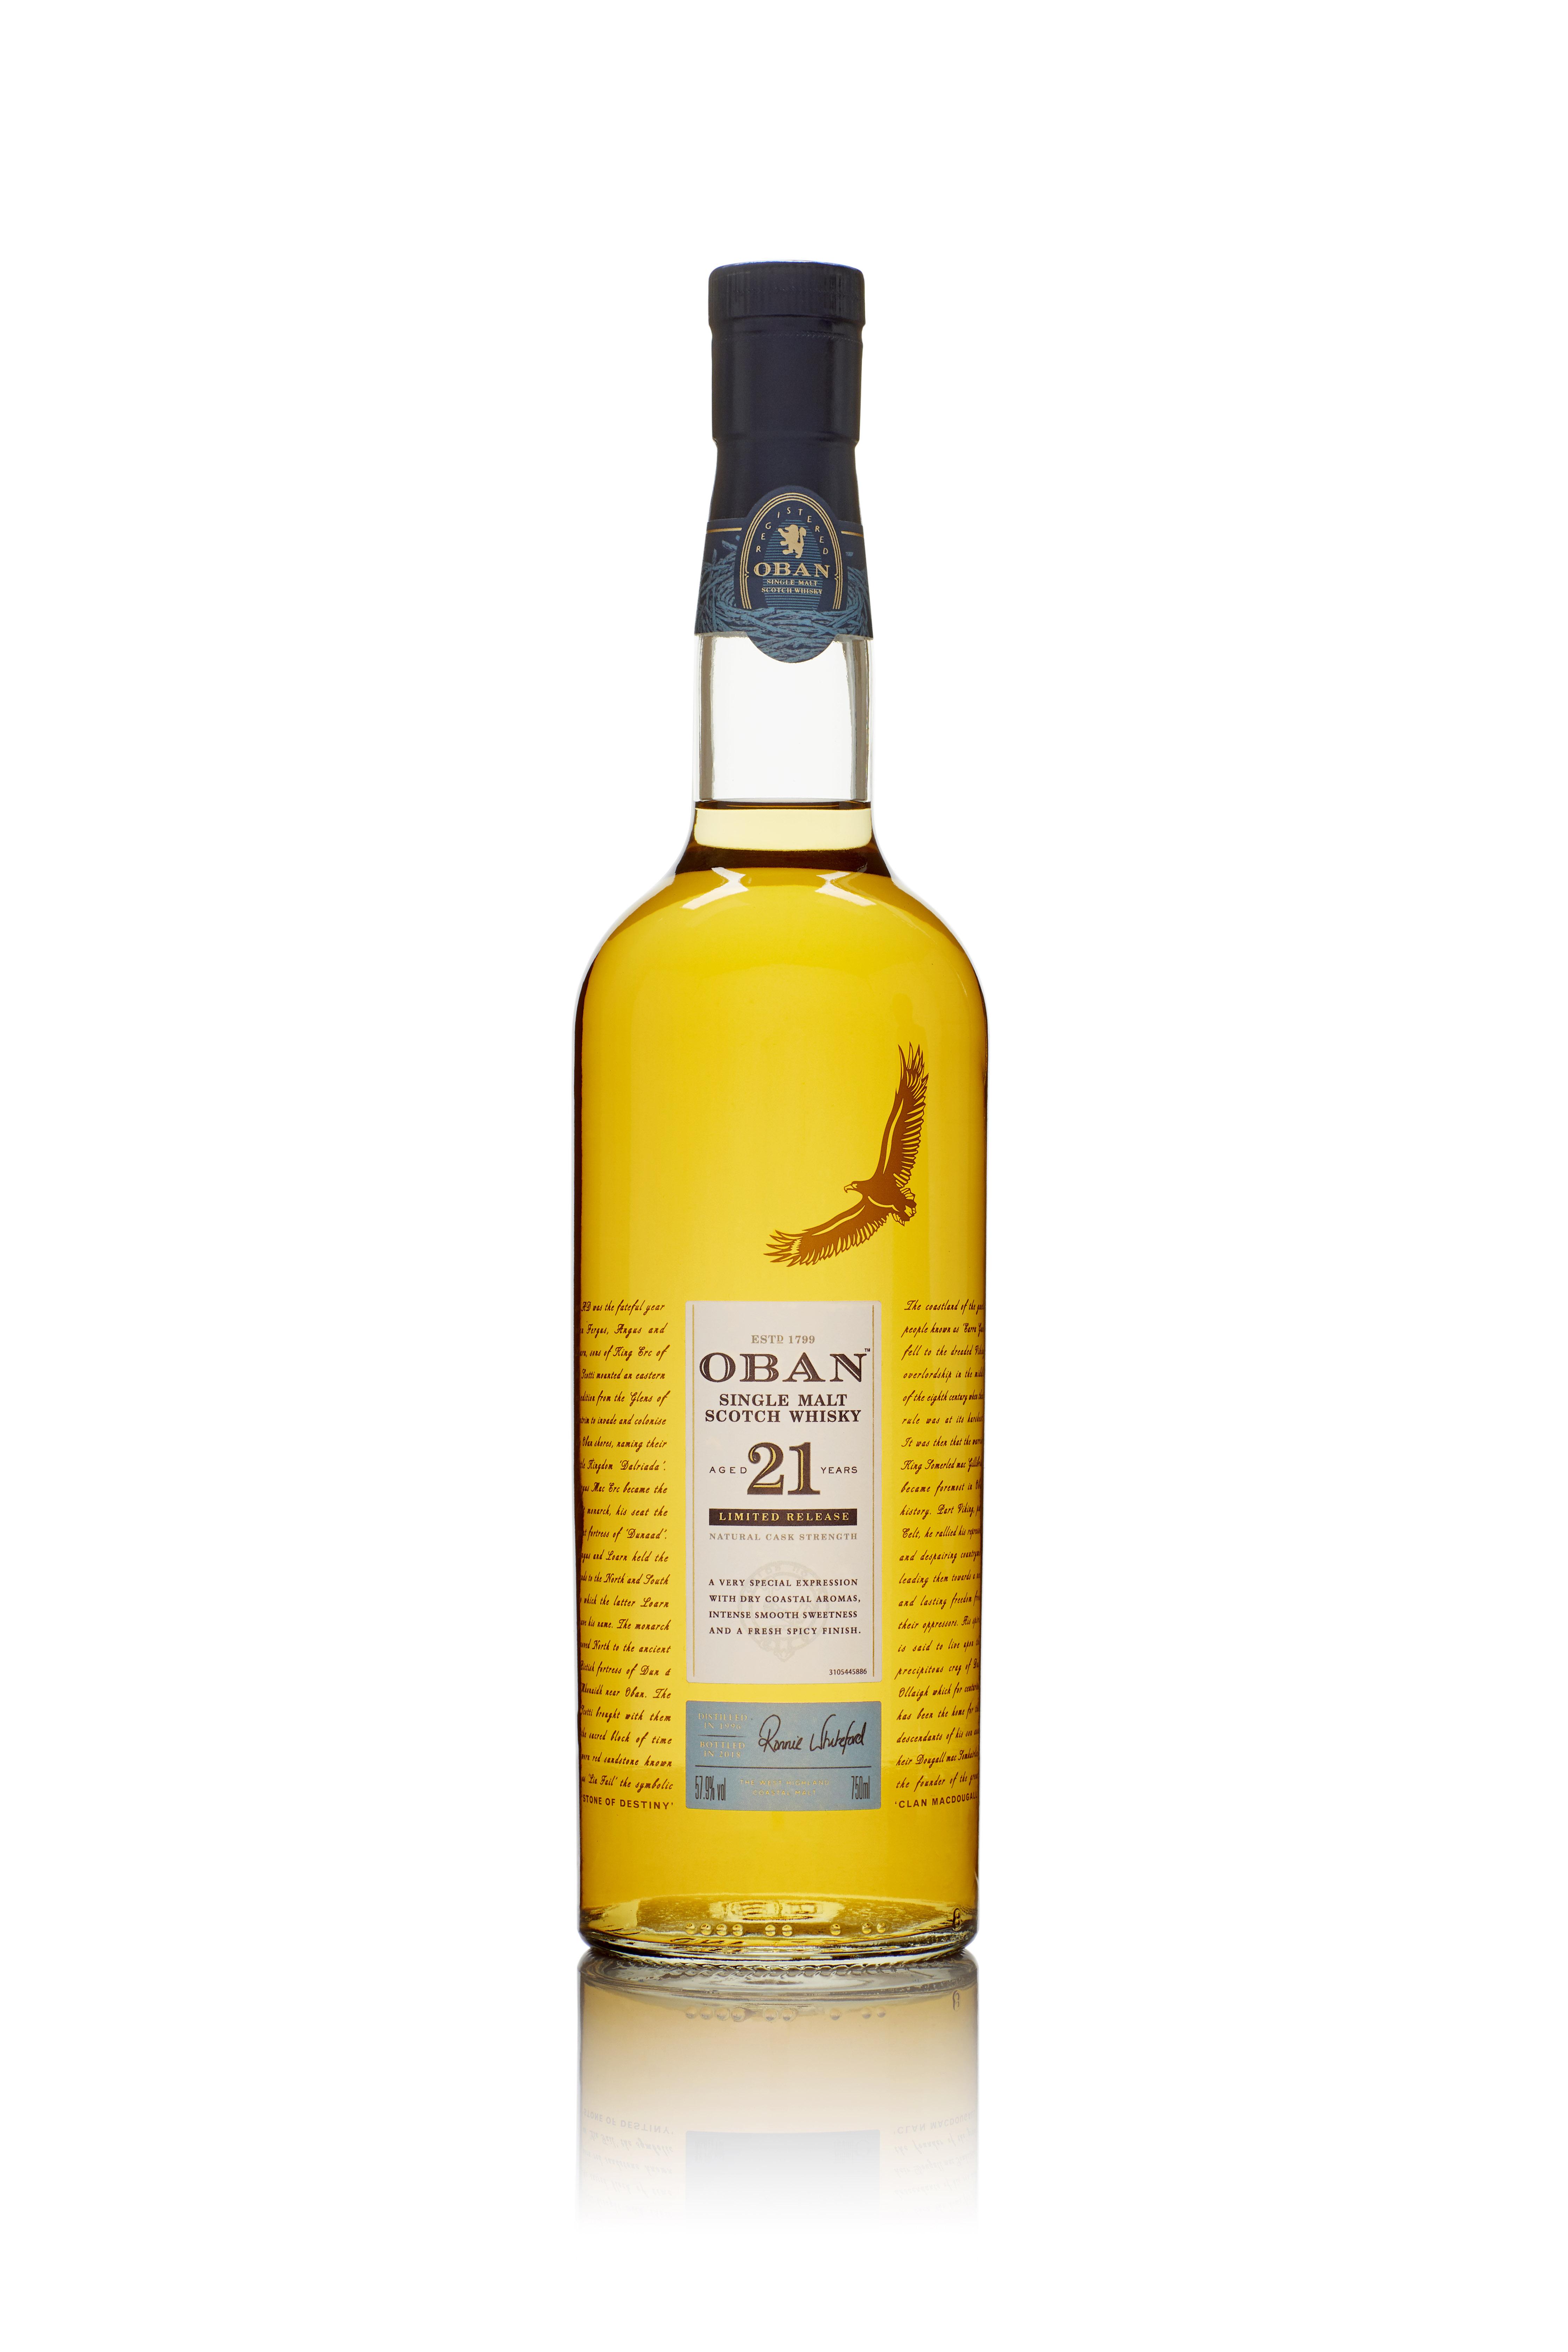 6281307 SR2018 Oban21 Bottle 750ml